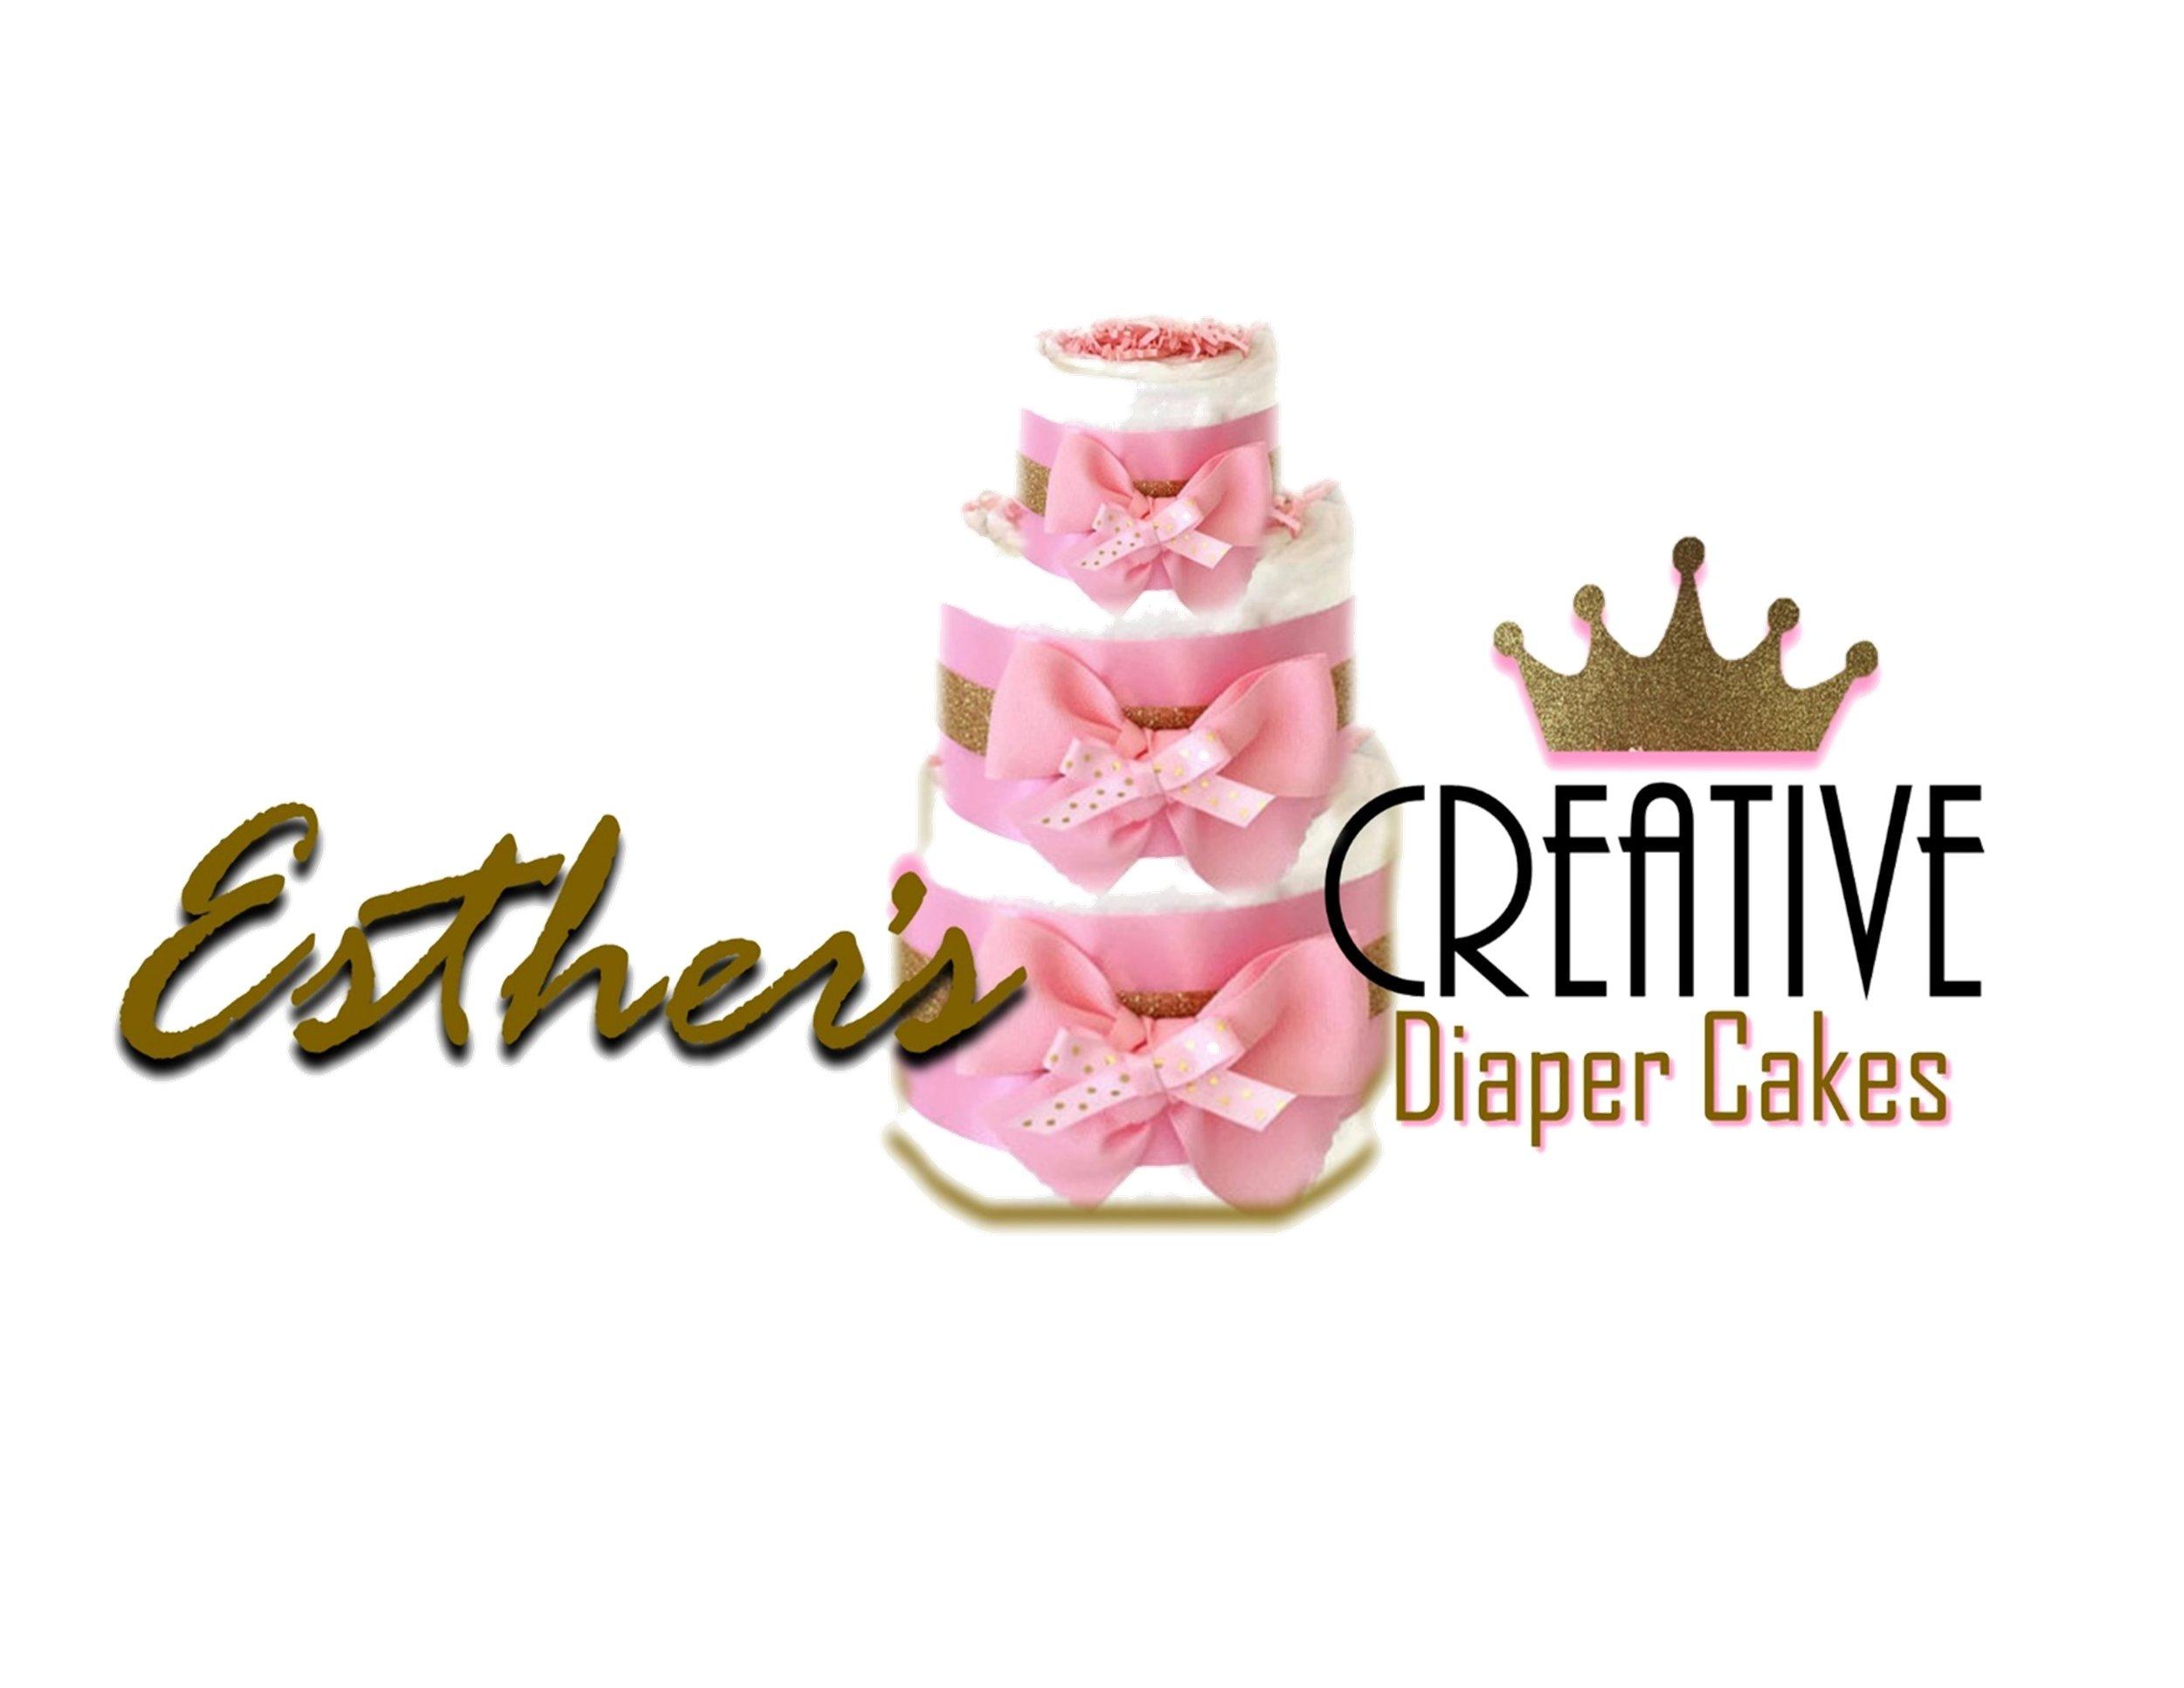 Ester's Creative Diaper Cakes LOGO.jpg